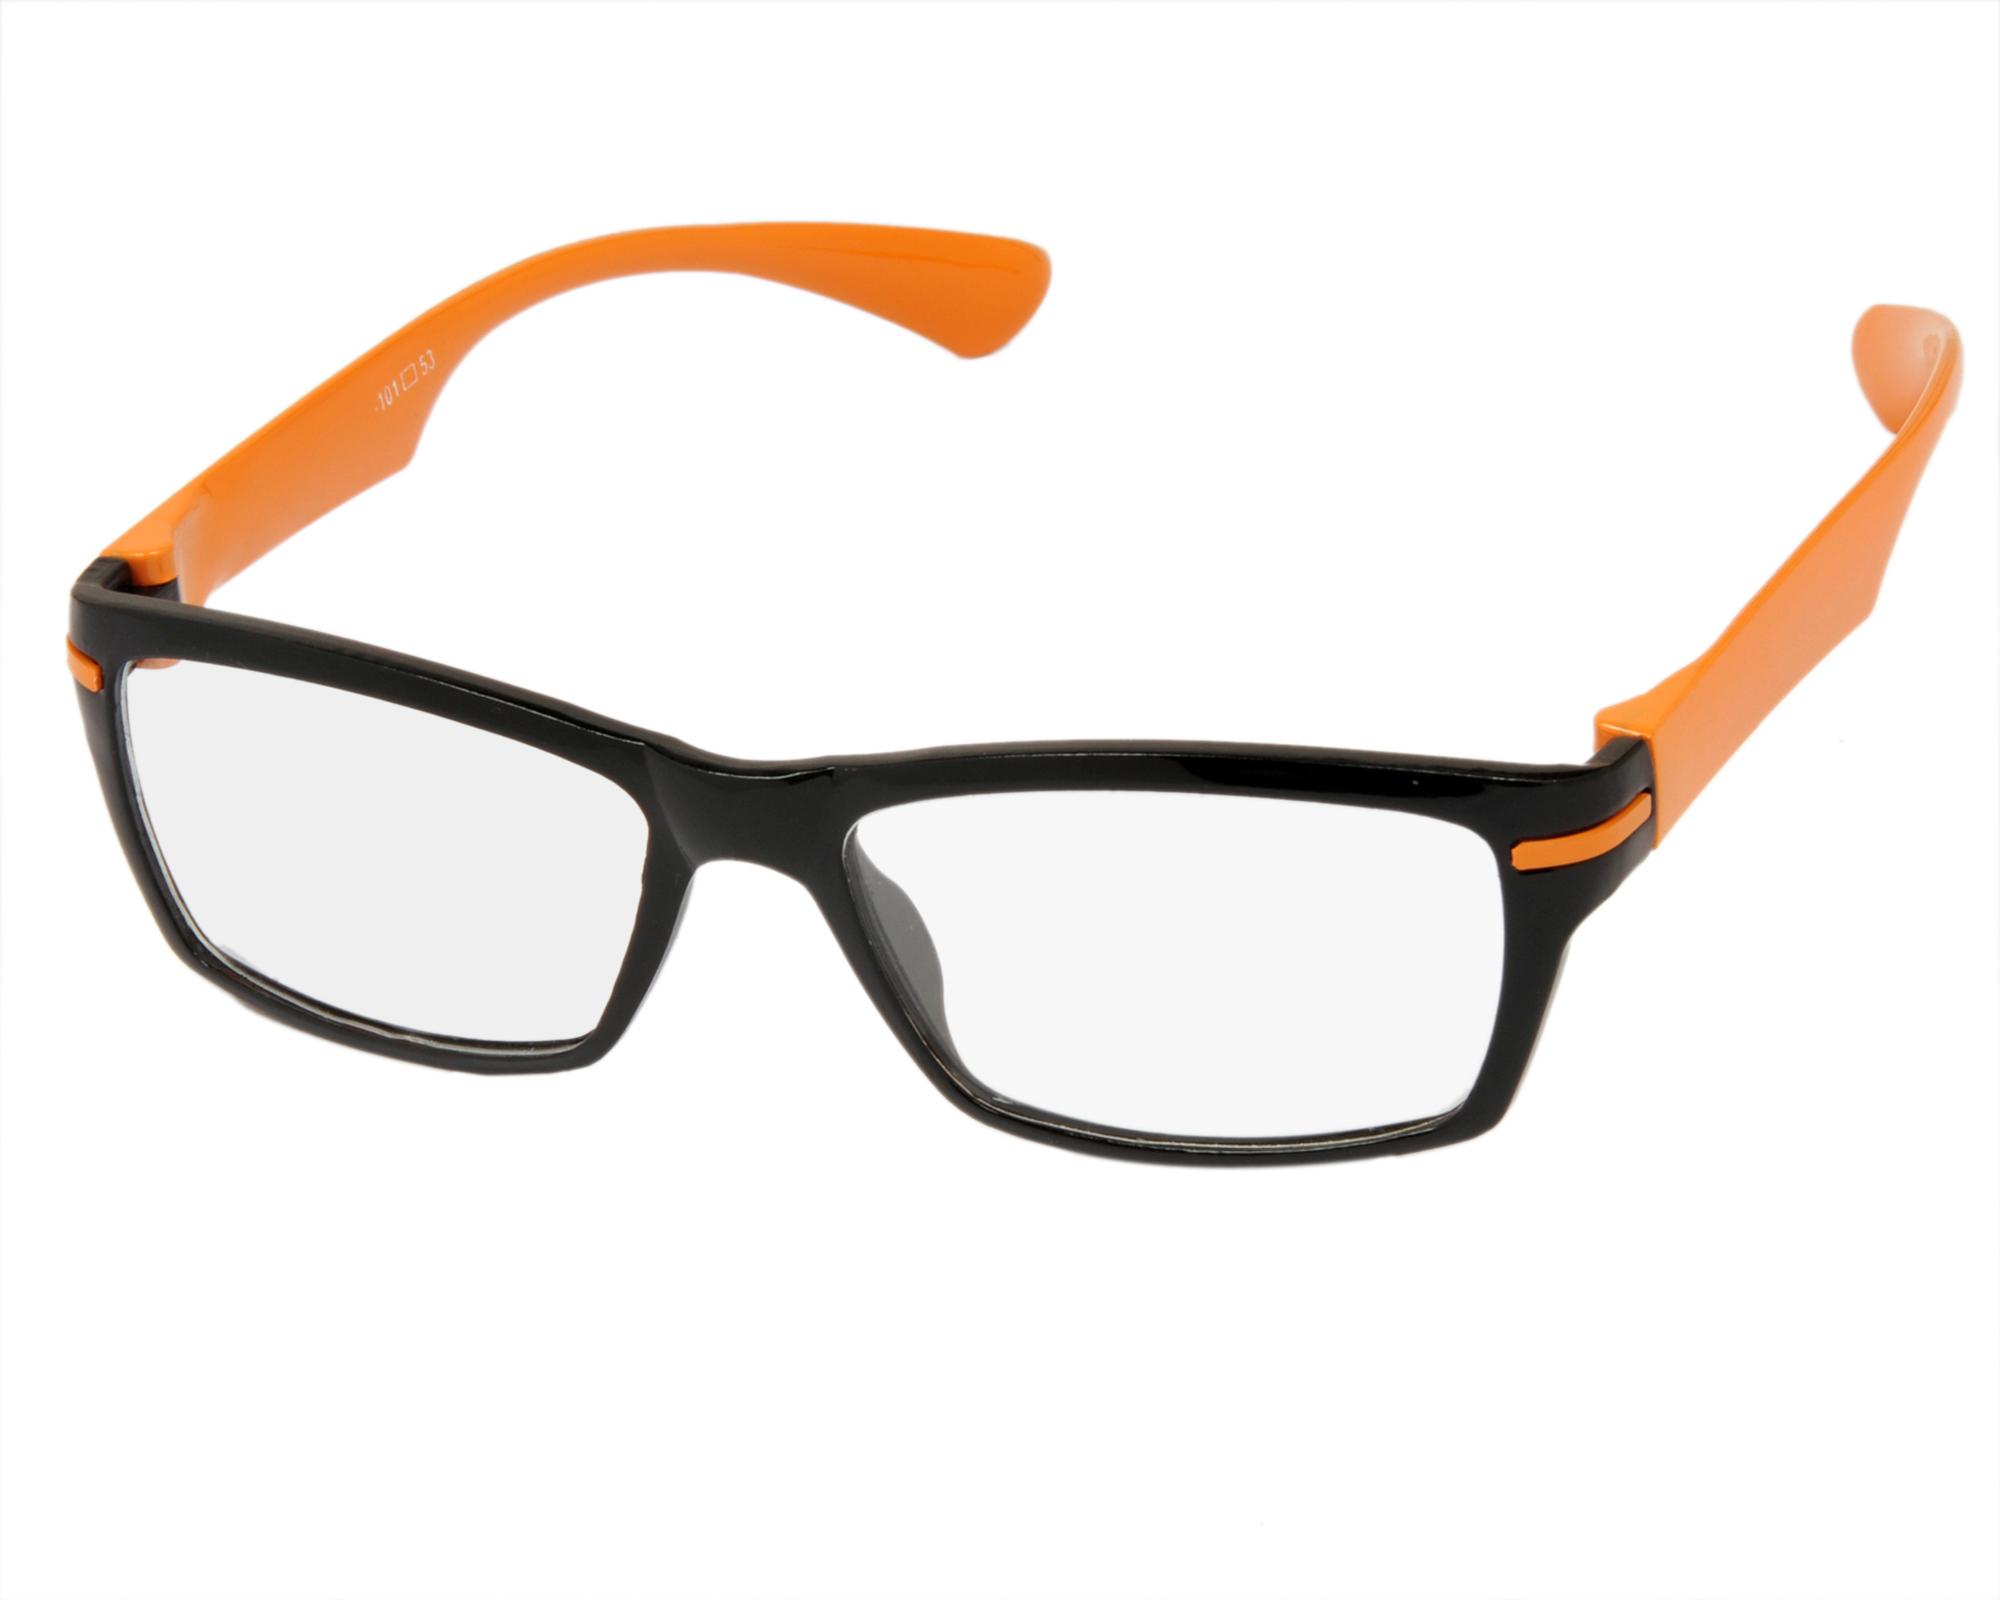 Aoito Black Front Orange Temples Spectacles Frames ...